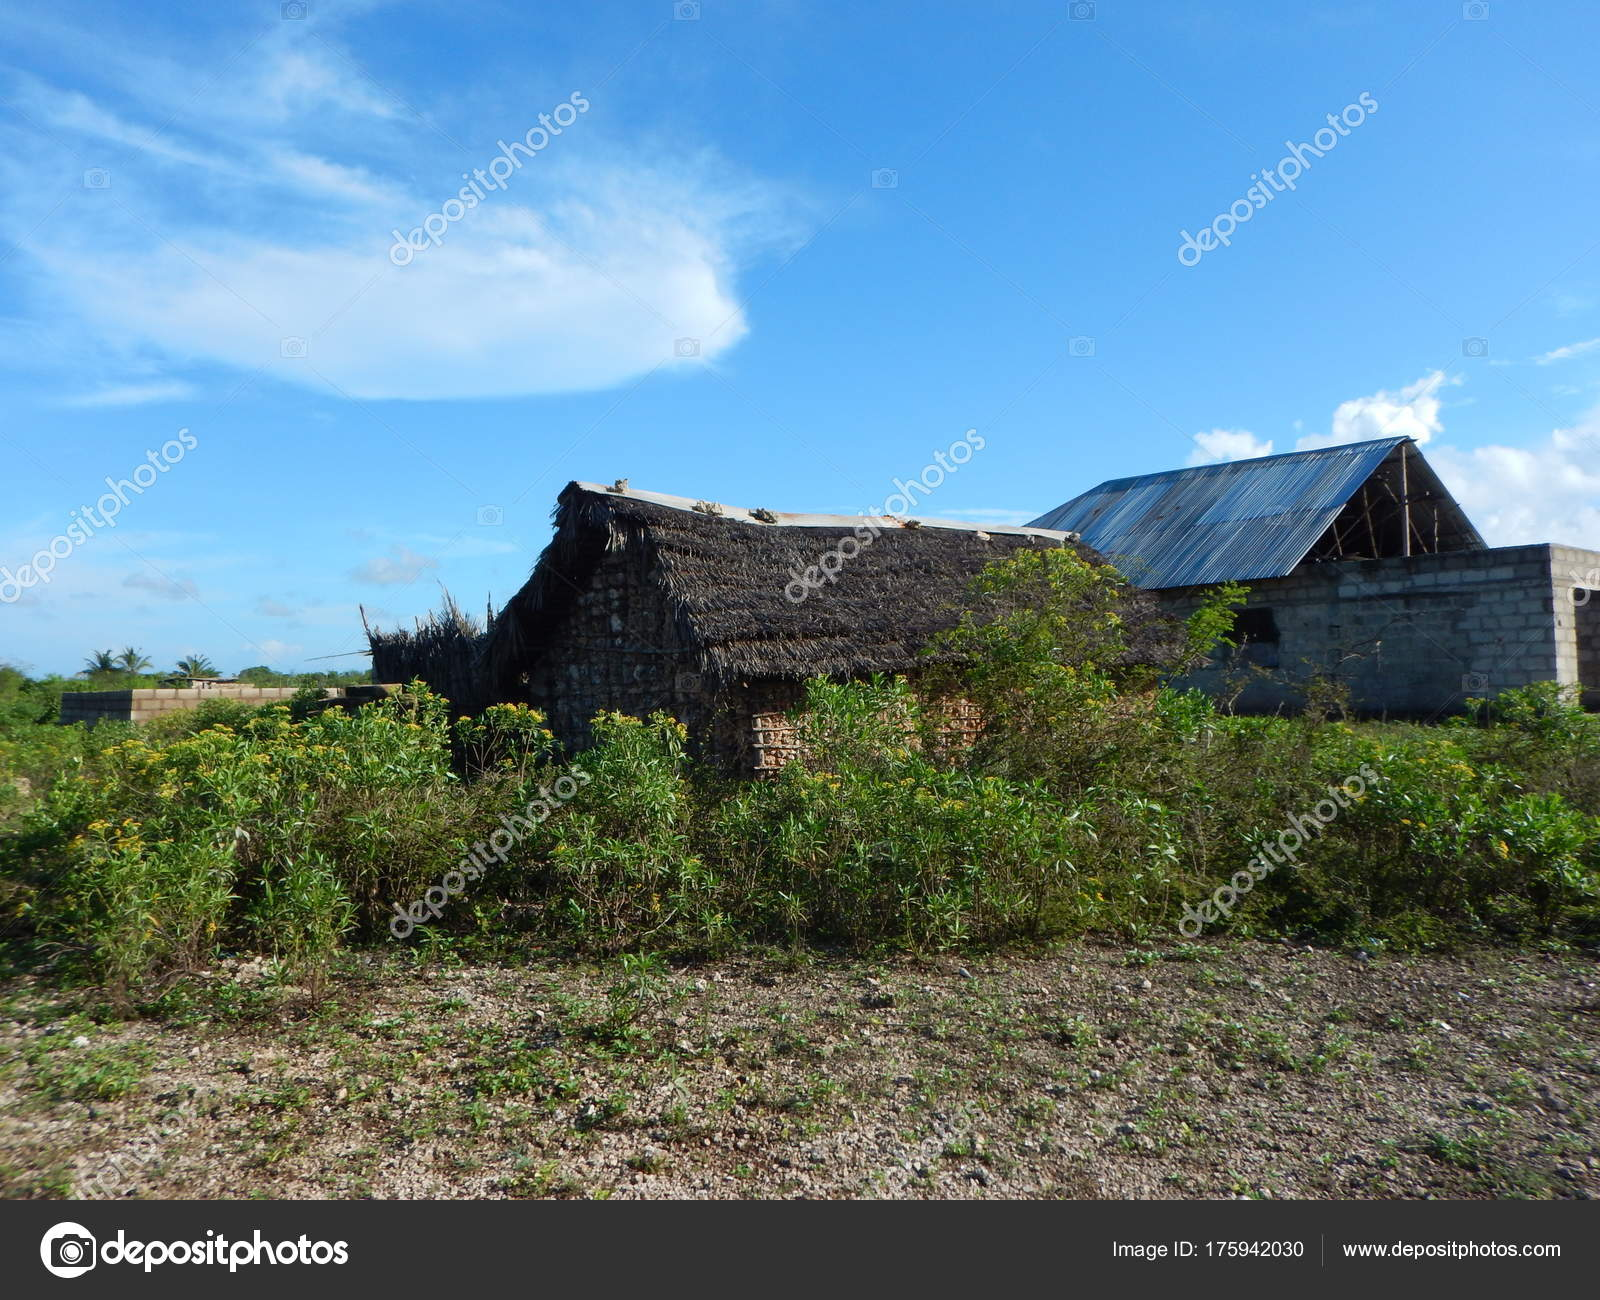 Simple House In A Village In Zanzibar Stock Photo Luciezr 175942030